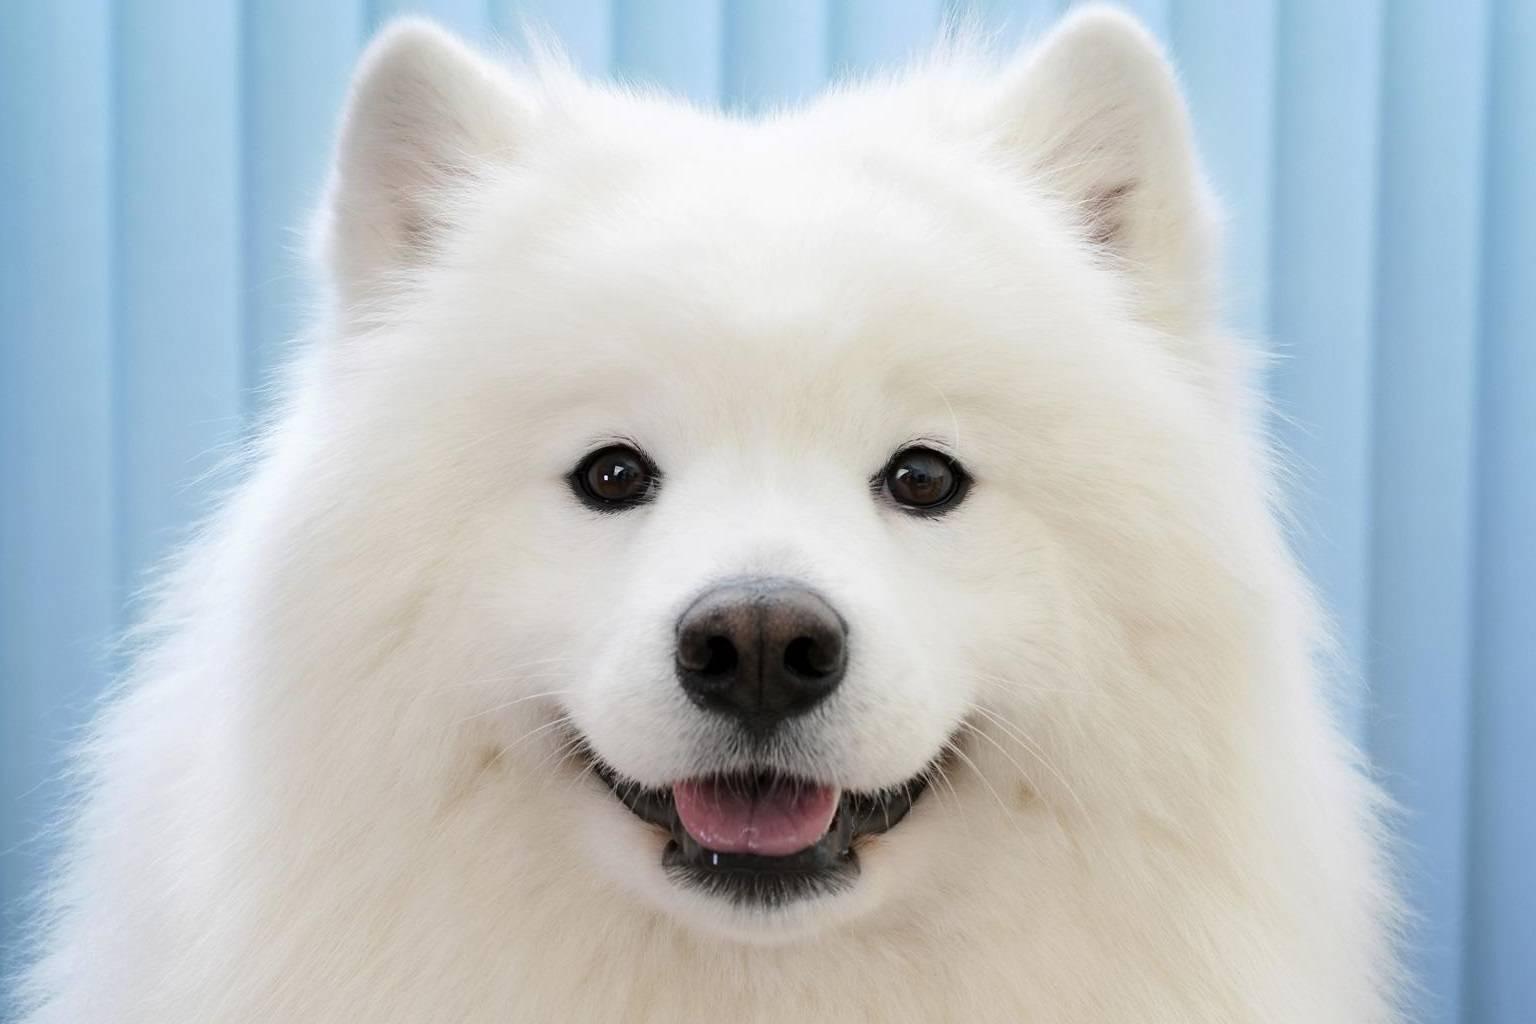 Puppy Smiley Face